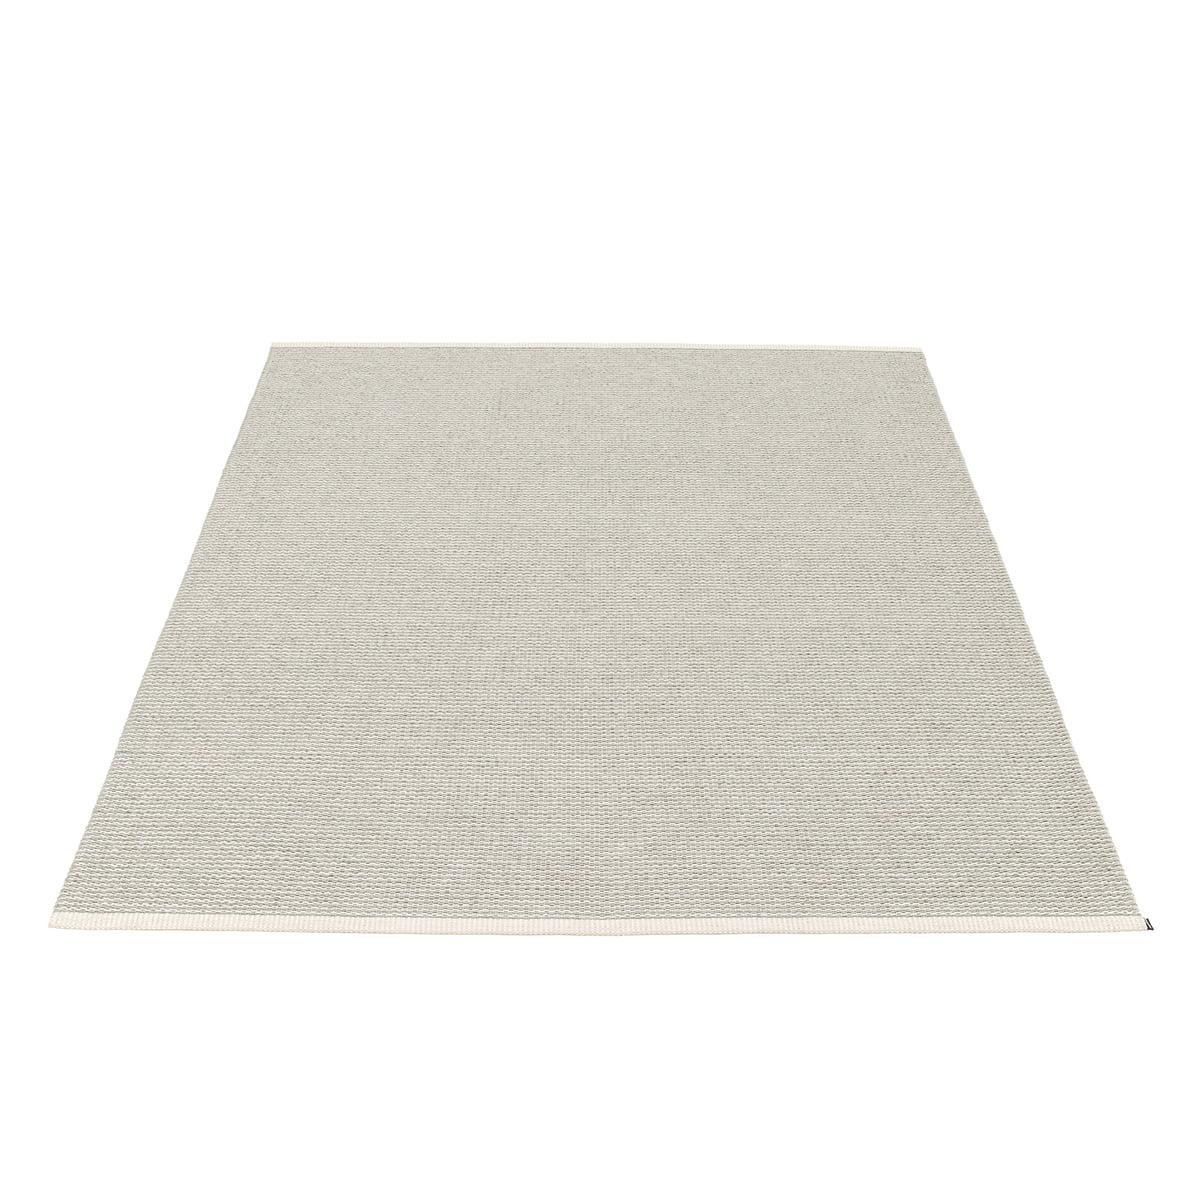 pappelina mono teppich 180 x 220 cm fossil grey warm grey grau t 180 h 0 b 220 online. Black Bedroom Furniture Sets. Home Design Ideas